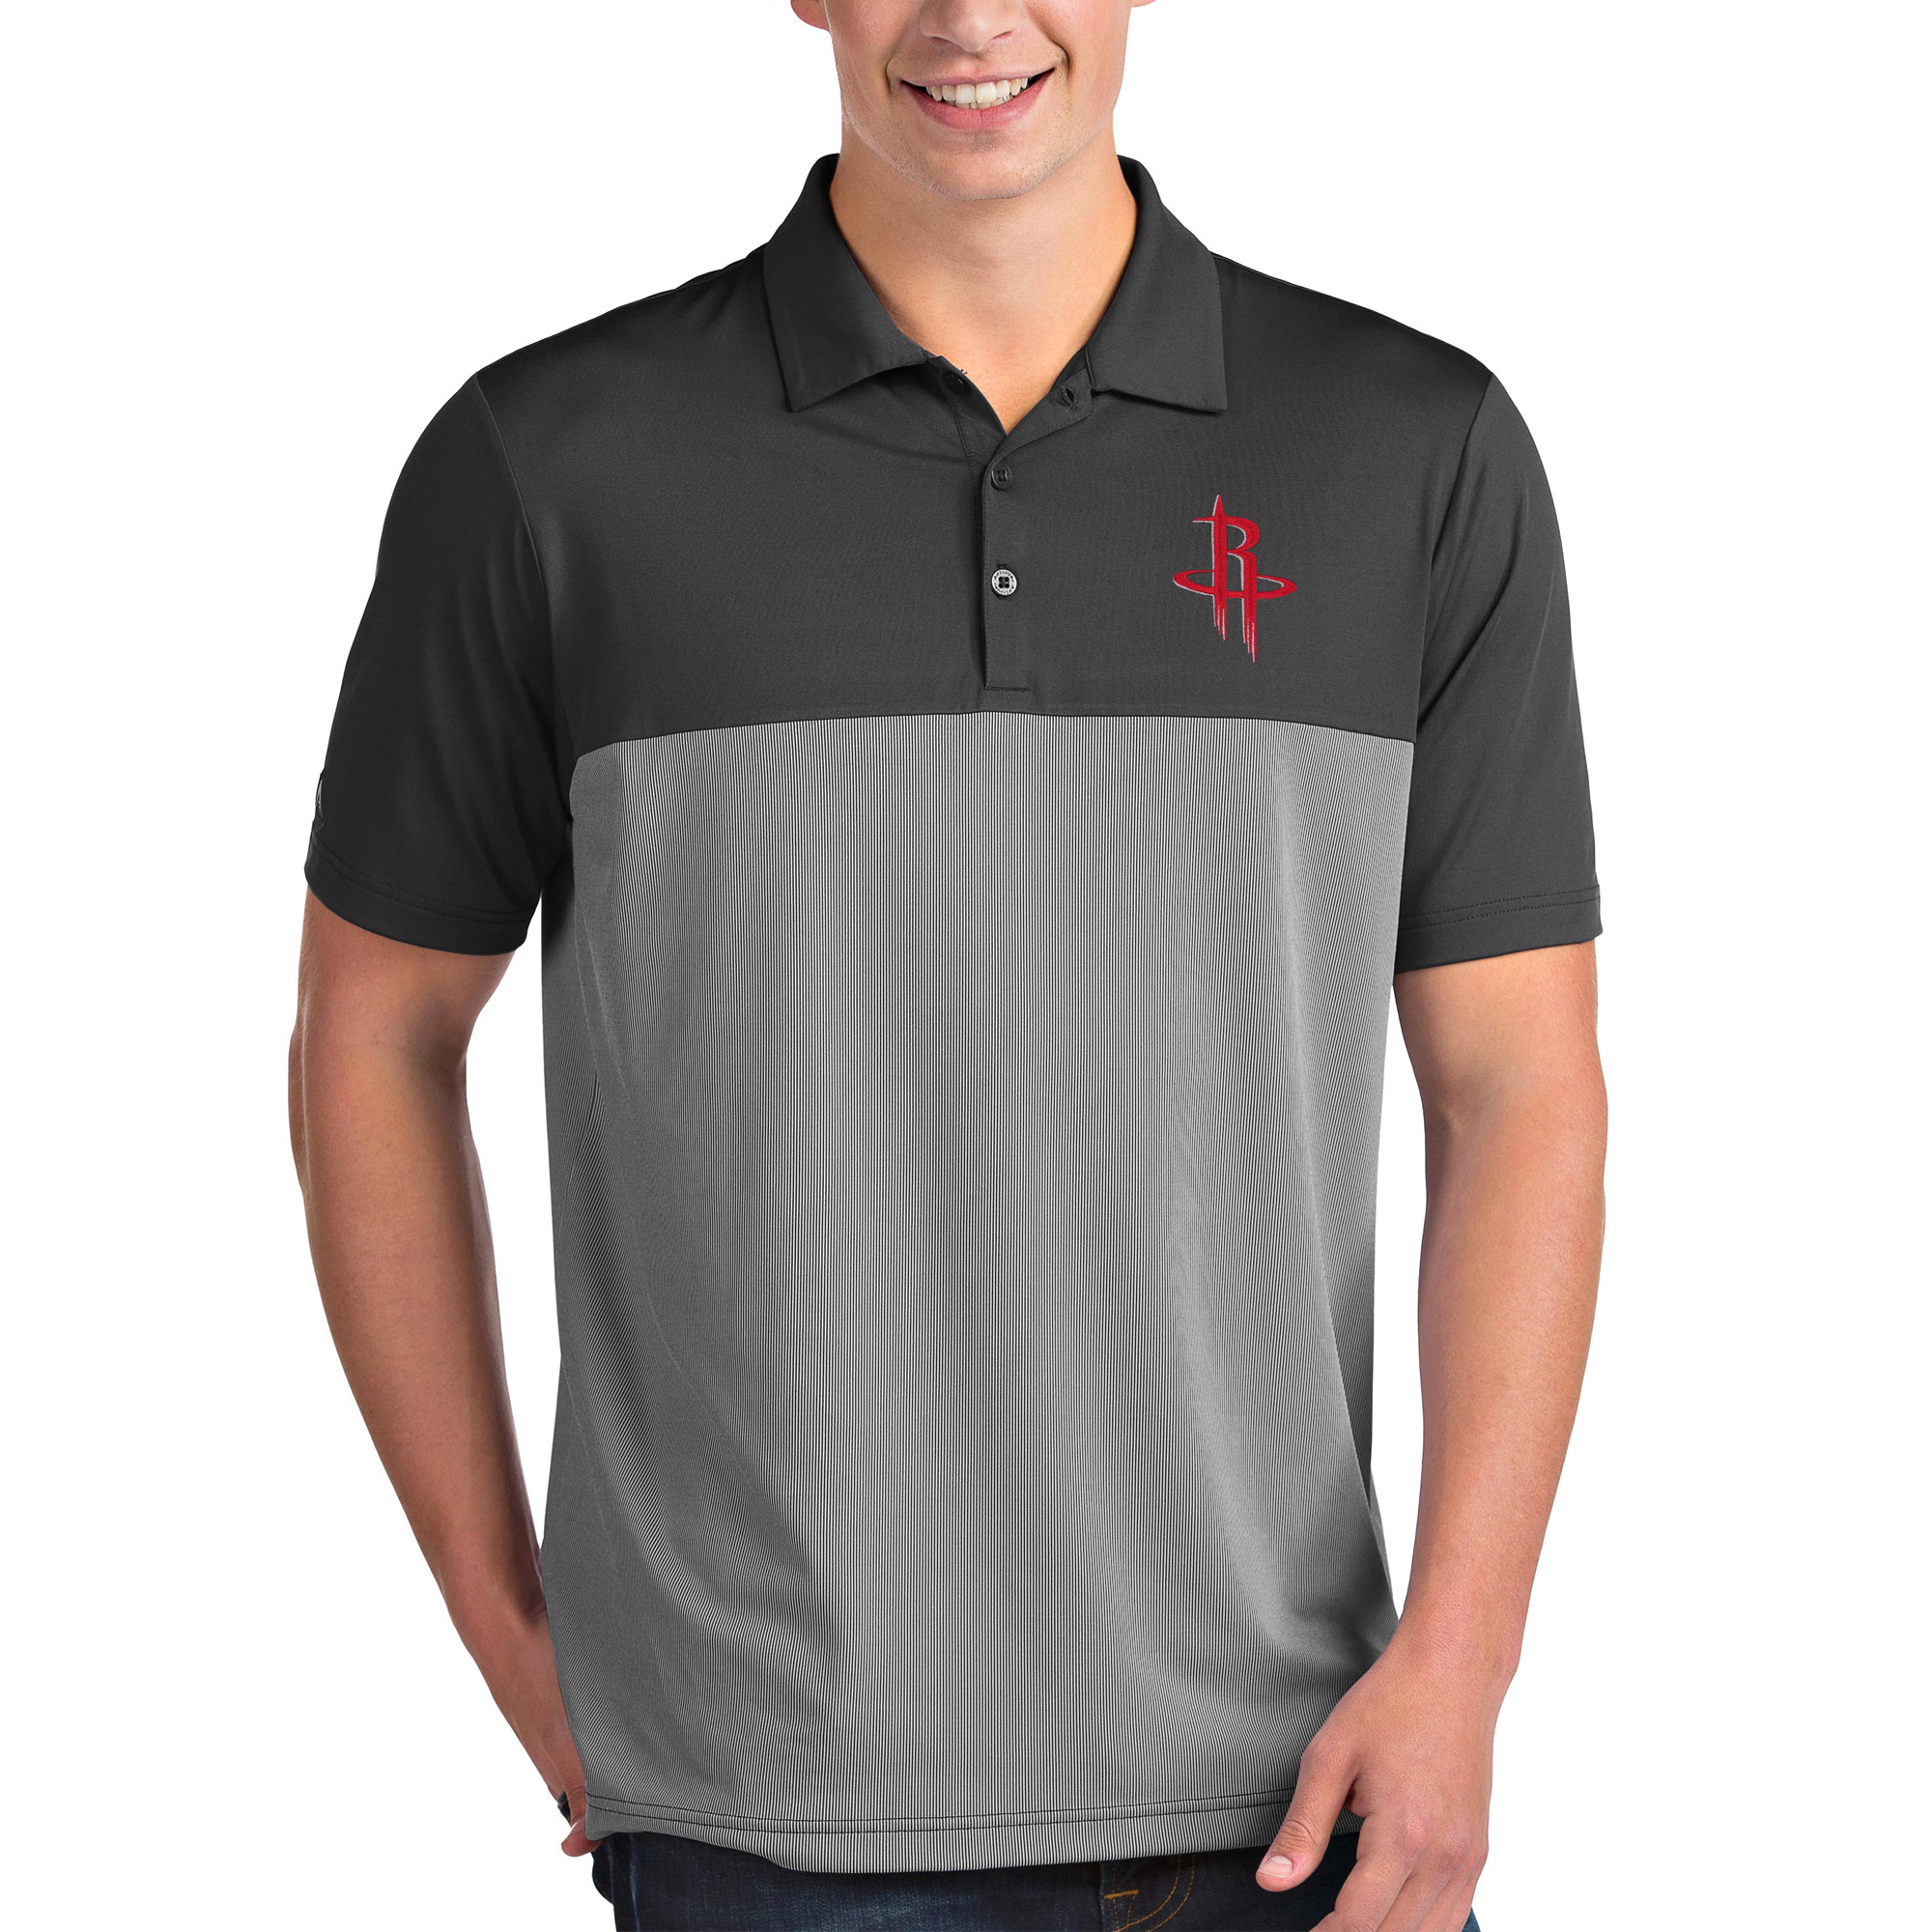 Houston Rockets Antigua Venture Polo - Charcoal/White